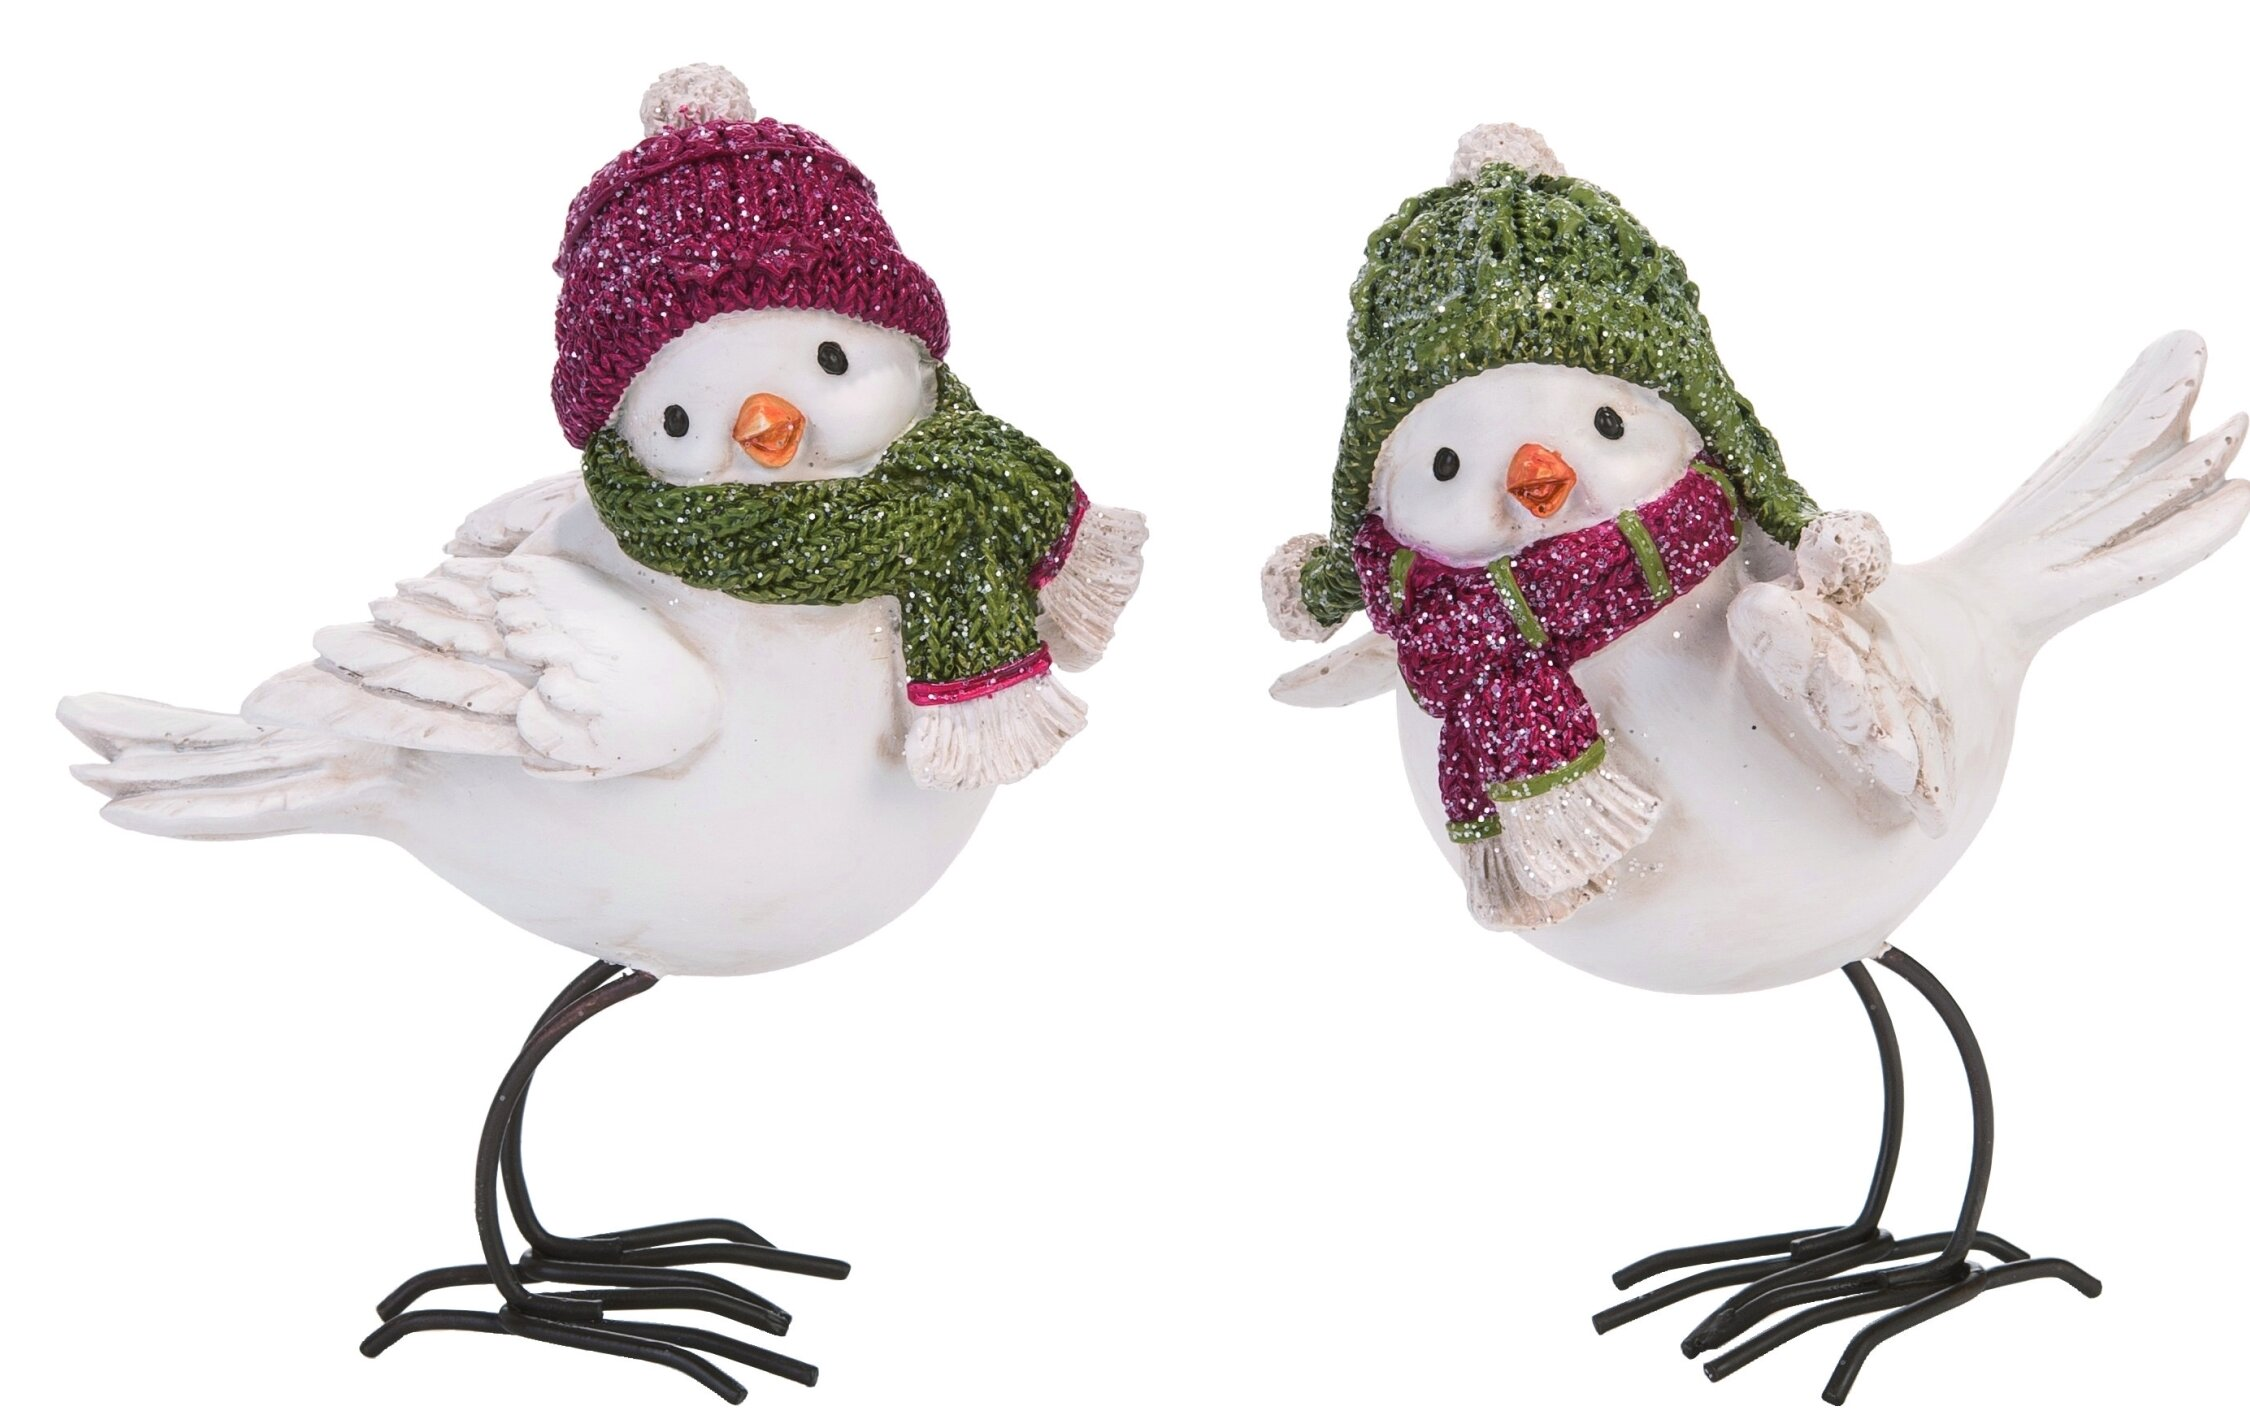 The Holiday Aisle 2 Piece Resin Christmas Standing Bird Couple Figurine Set Wayfair